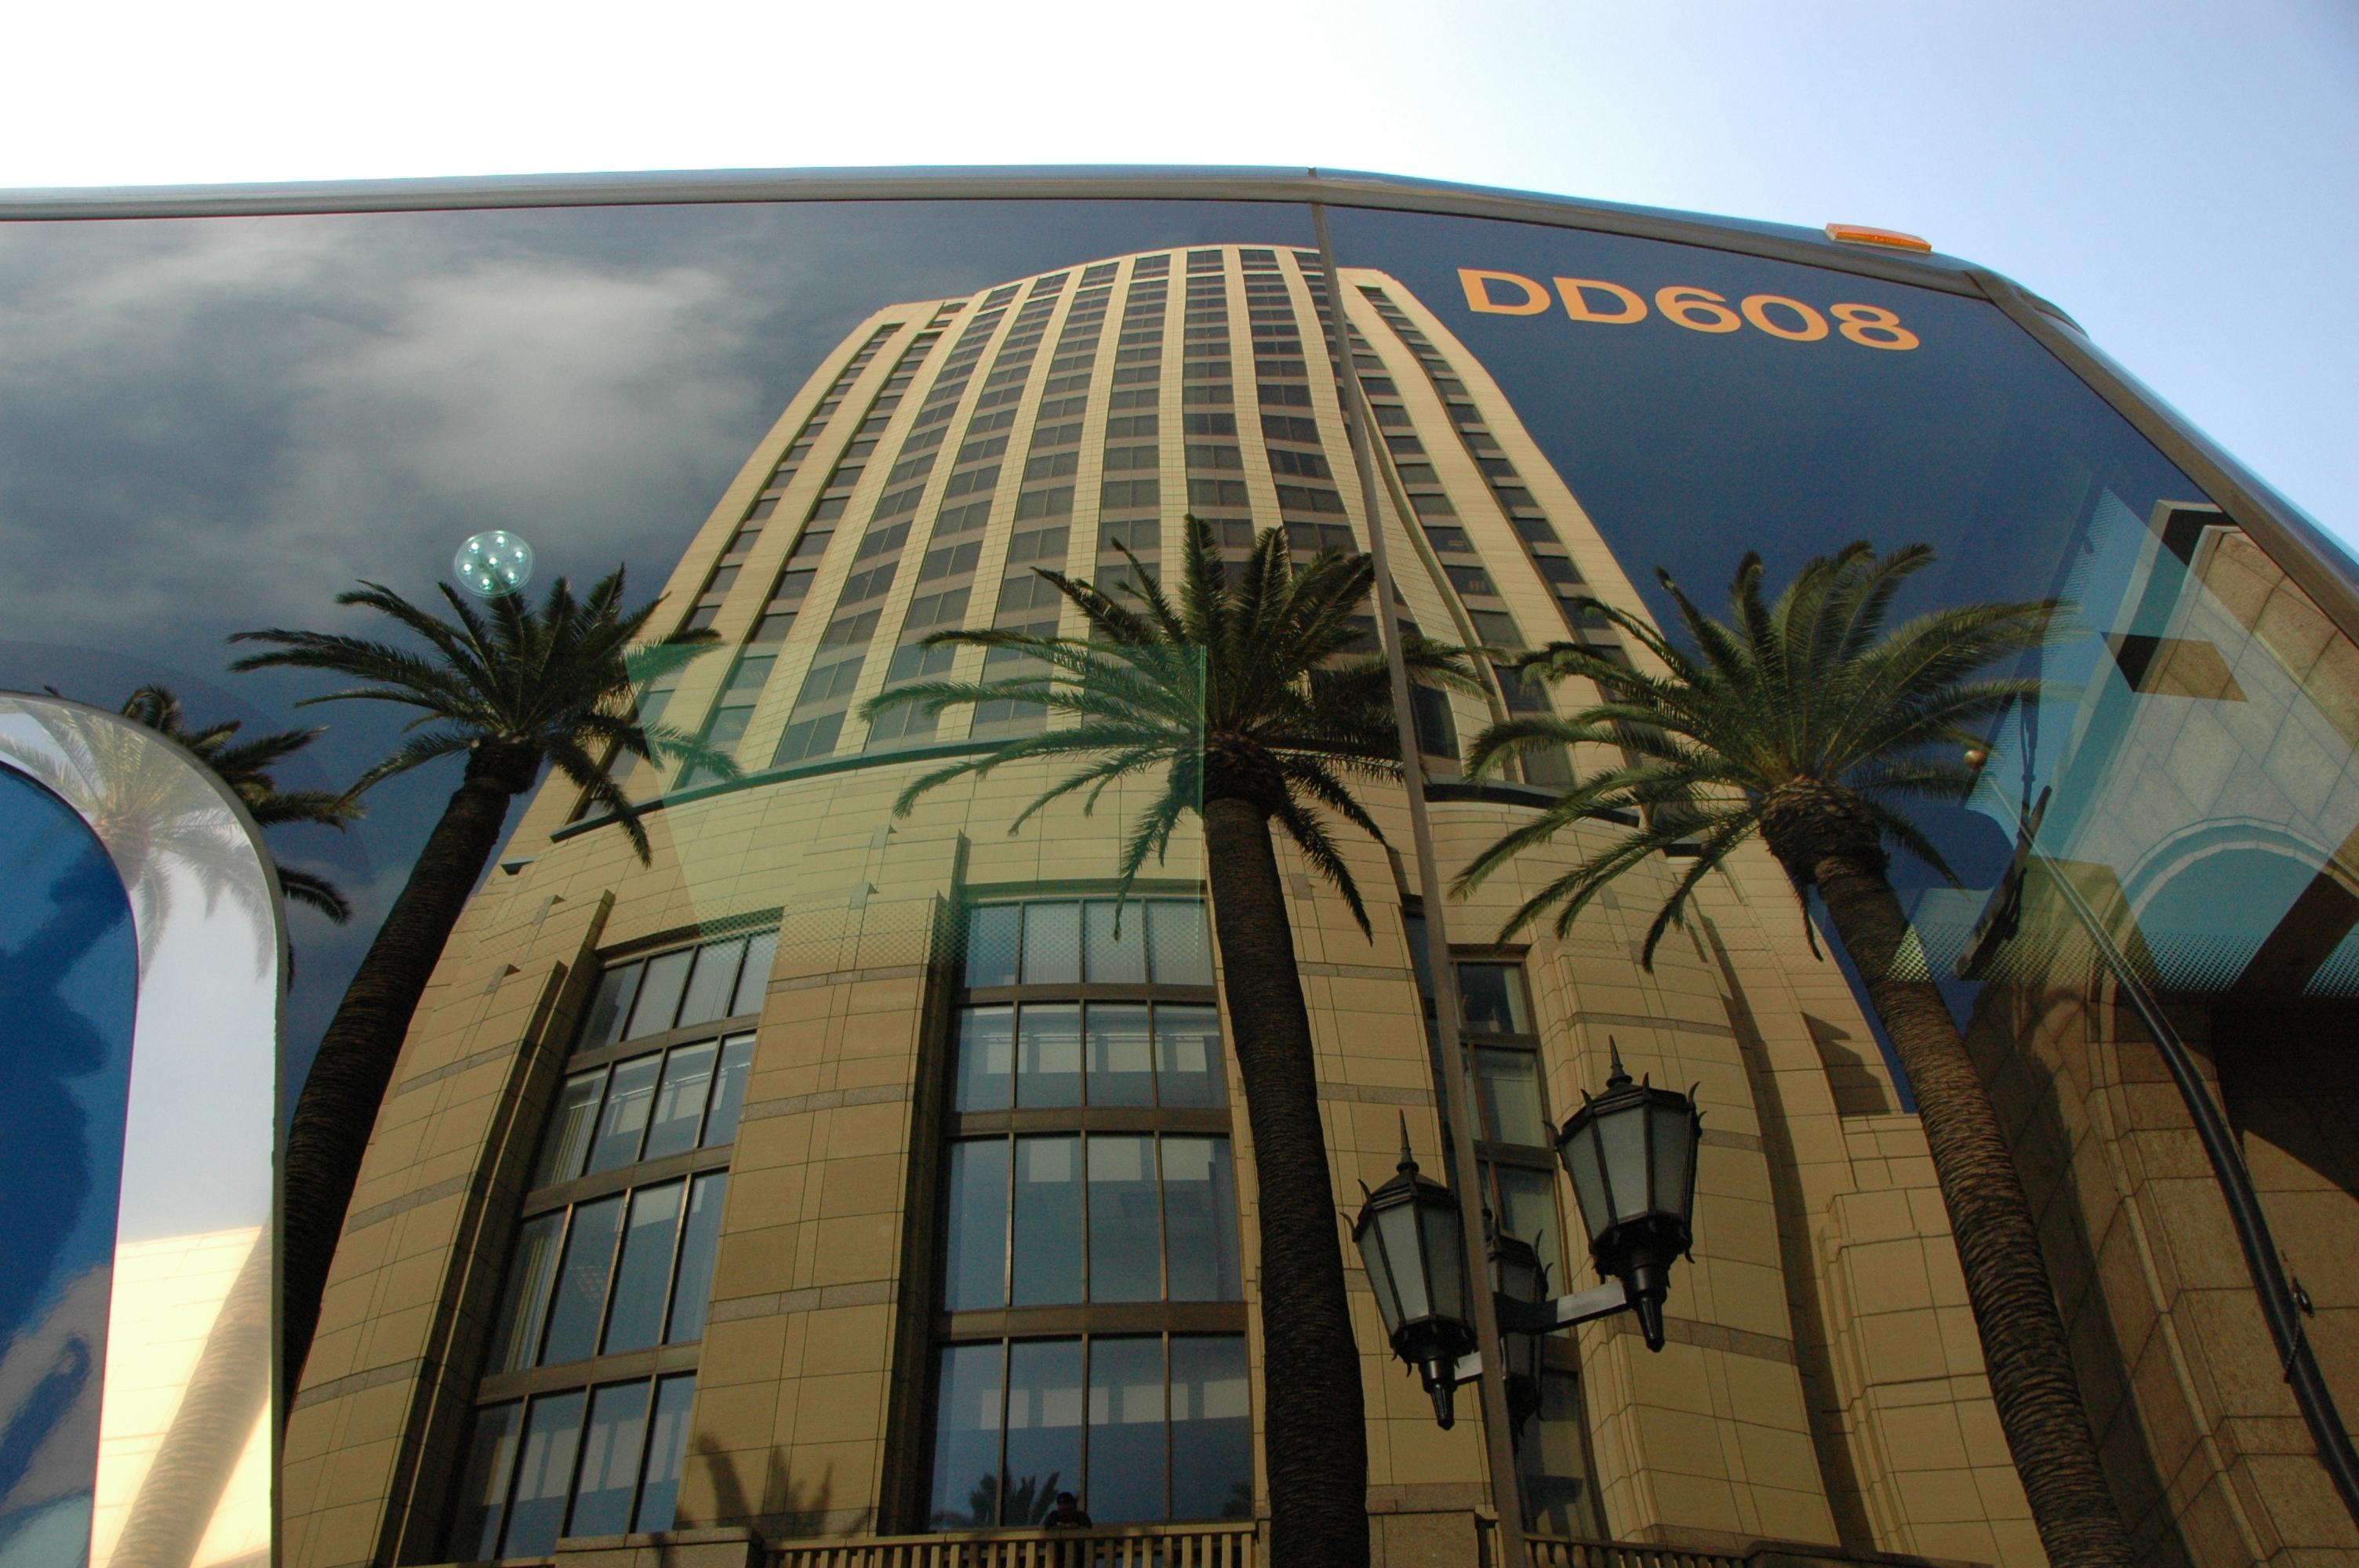 Gateway Building